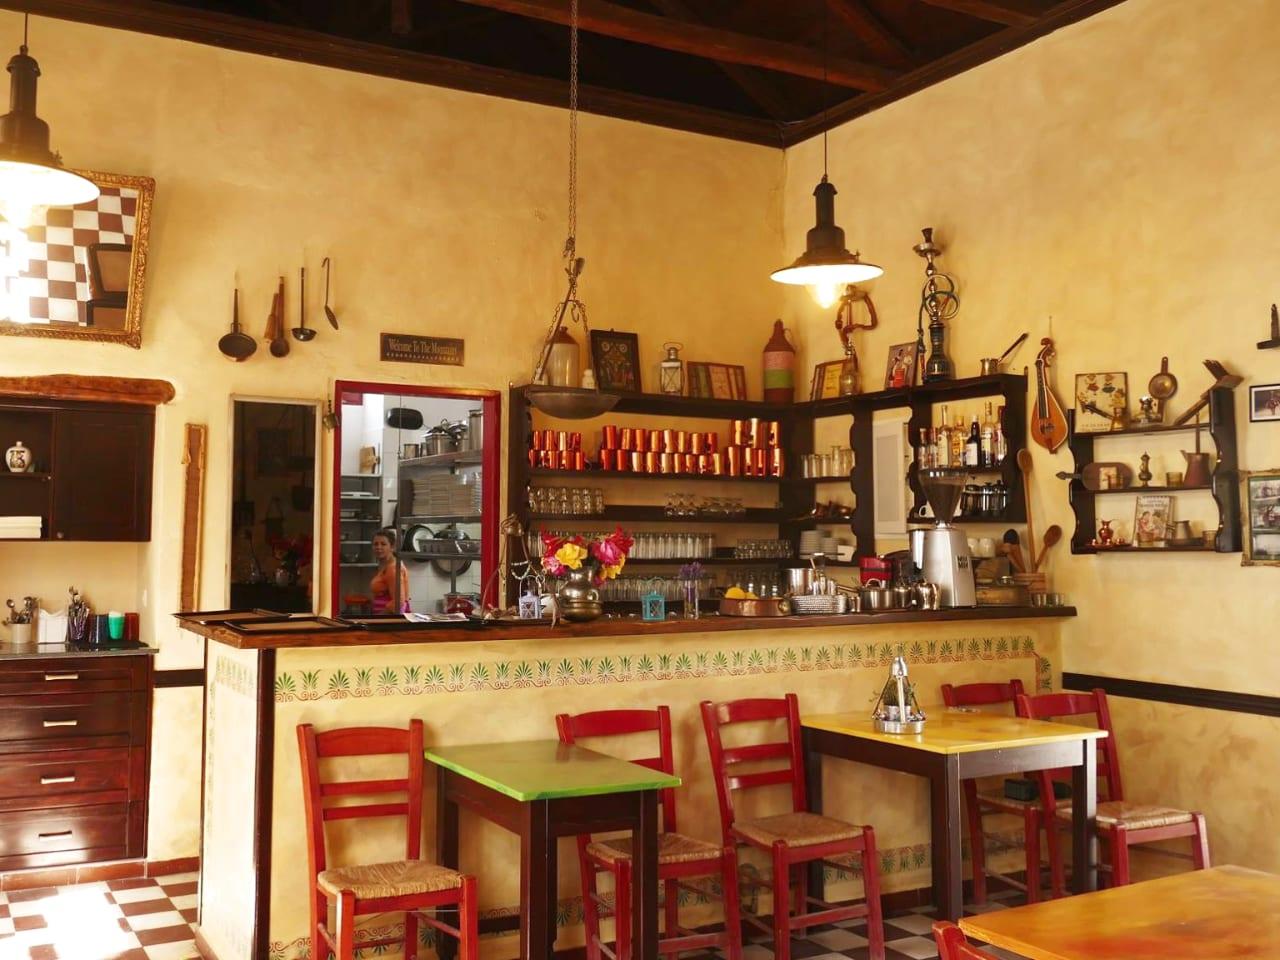 The interior of Old School at Anidri Village, Paleo scolio anidri village, old school anidri village paleochora, eatery restaurant paleo scolio